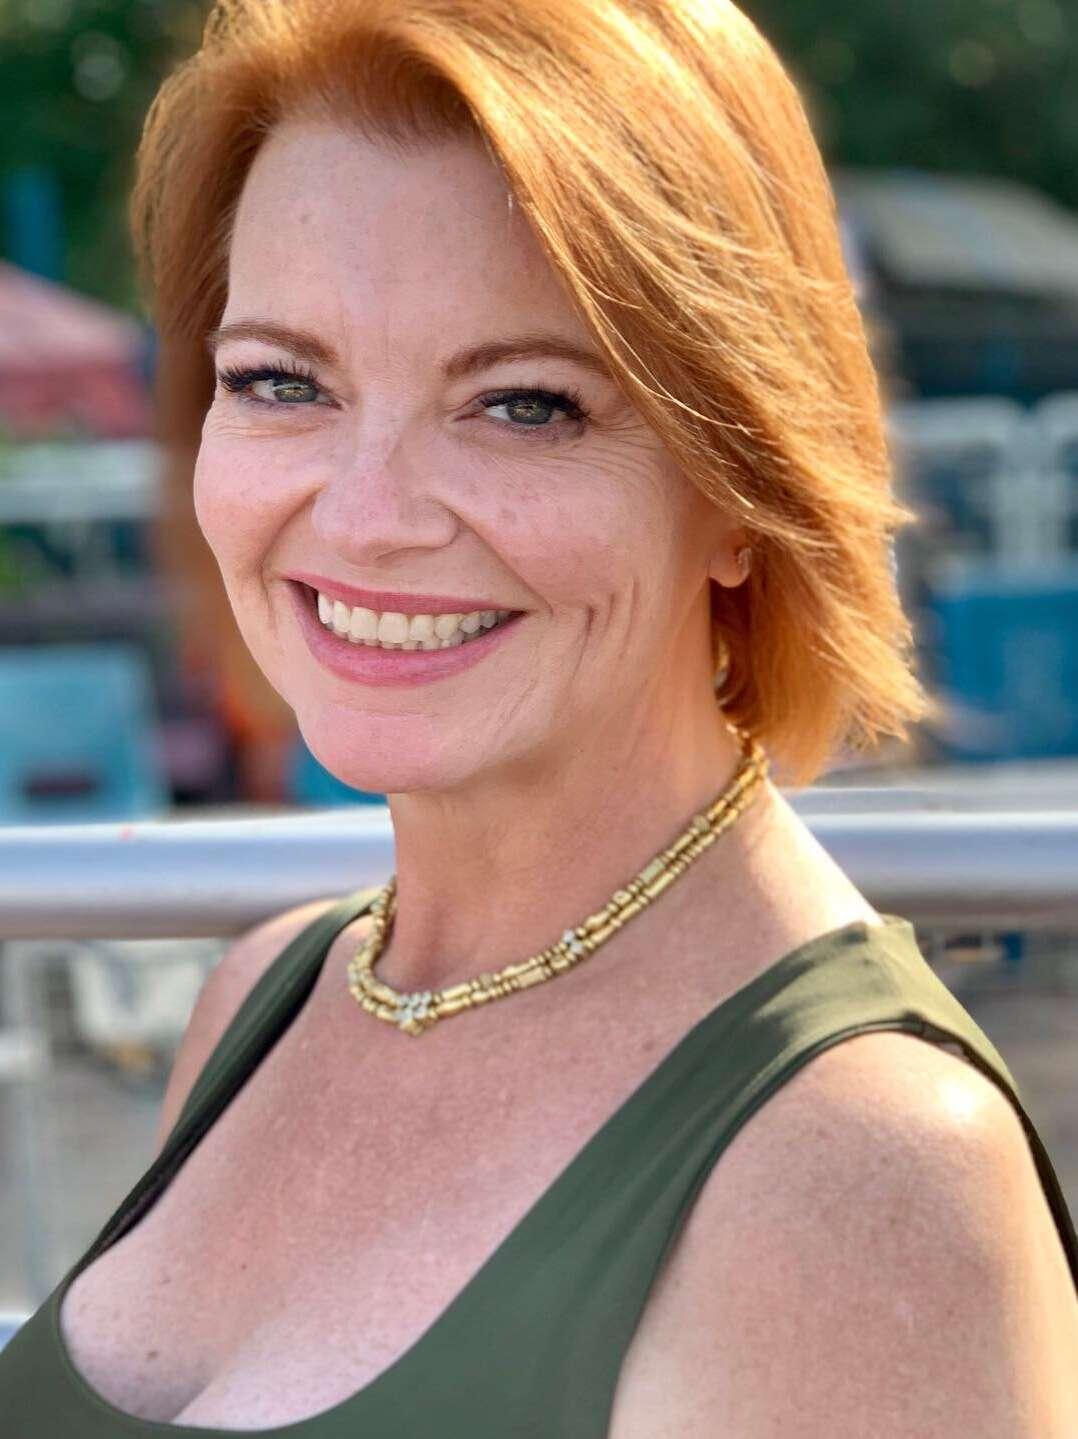 Tammi Van Volkinburgh